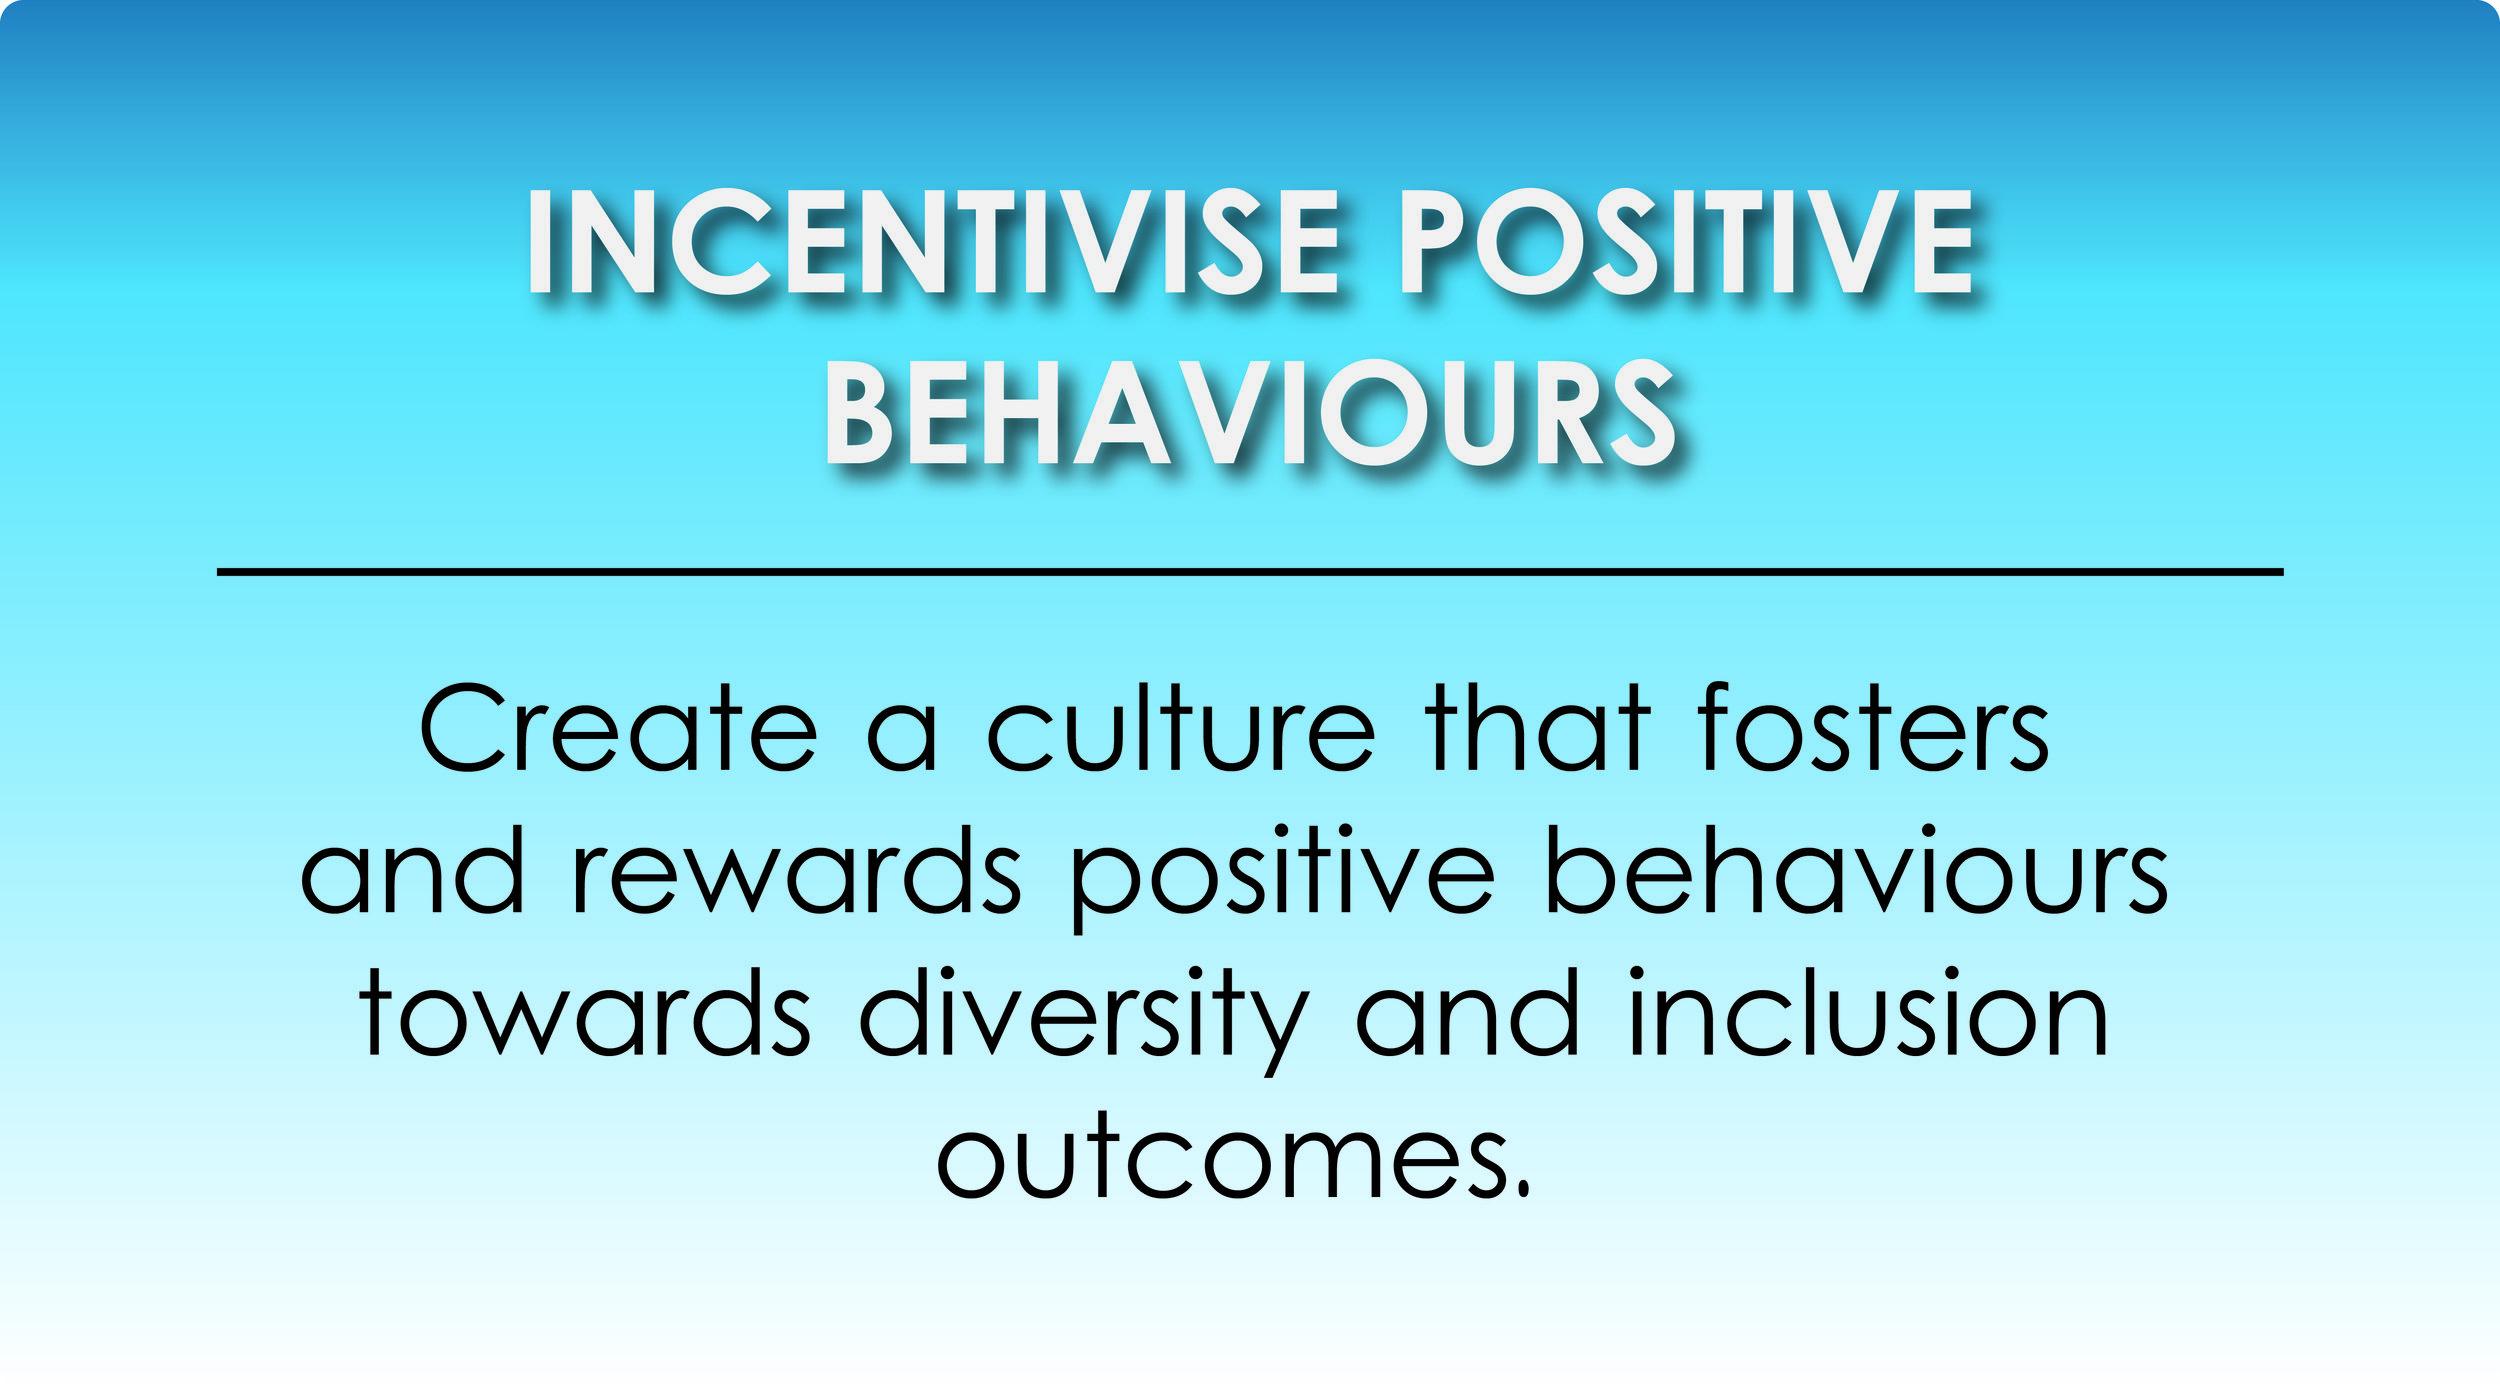 Incentivise Positive Behaviors2.jpg